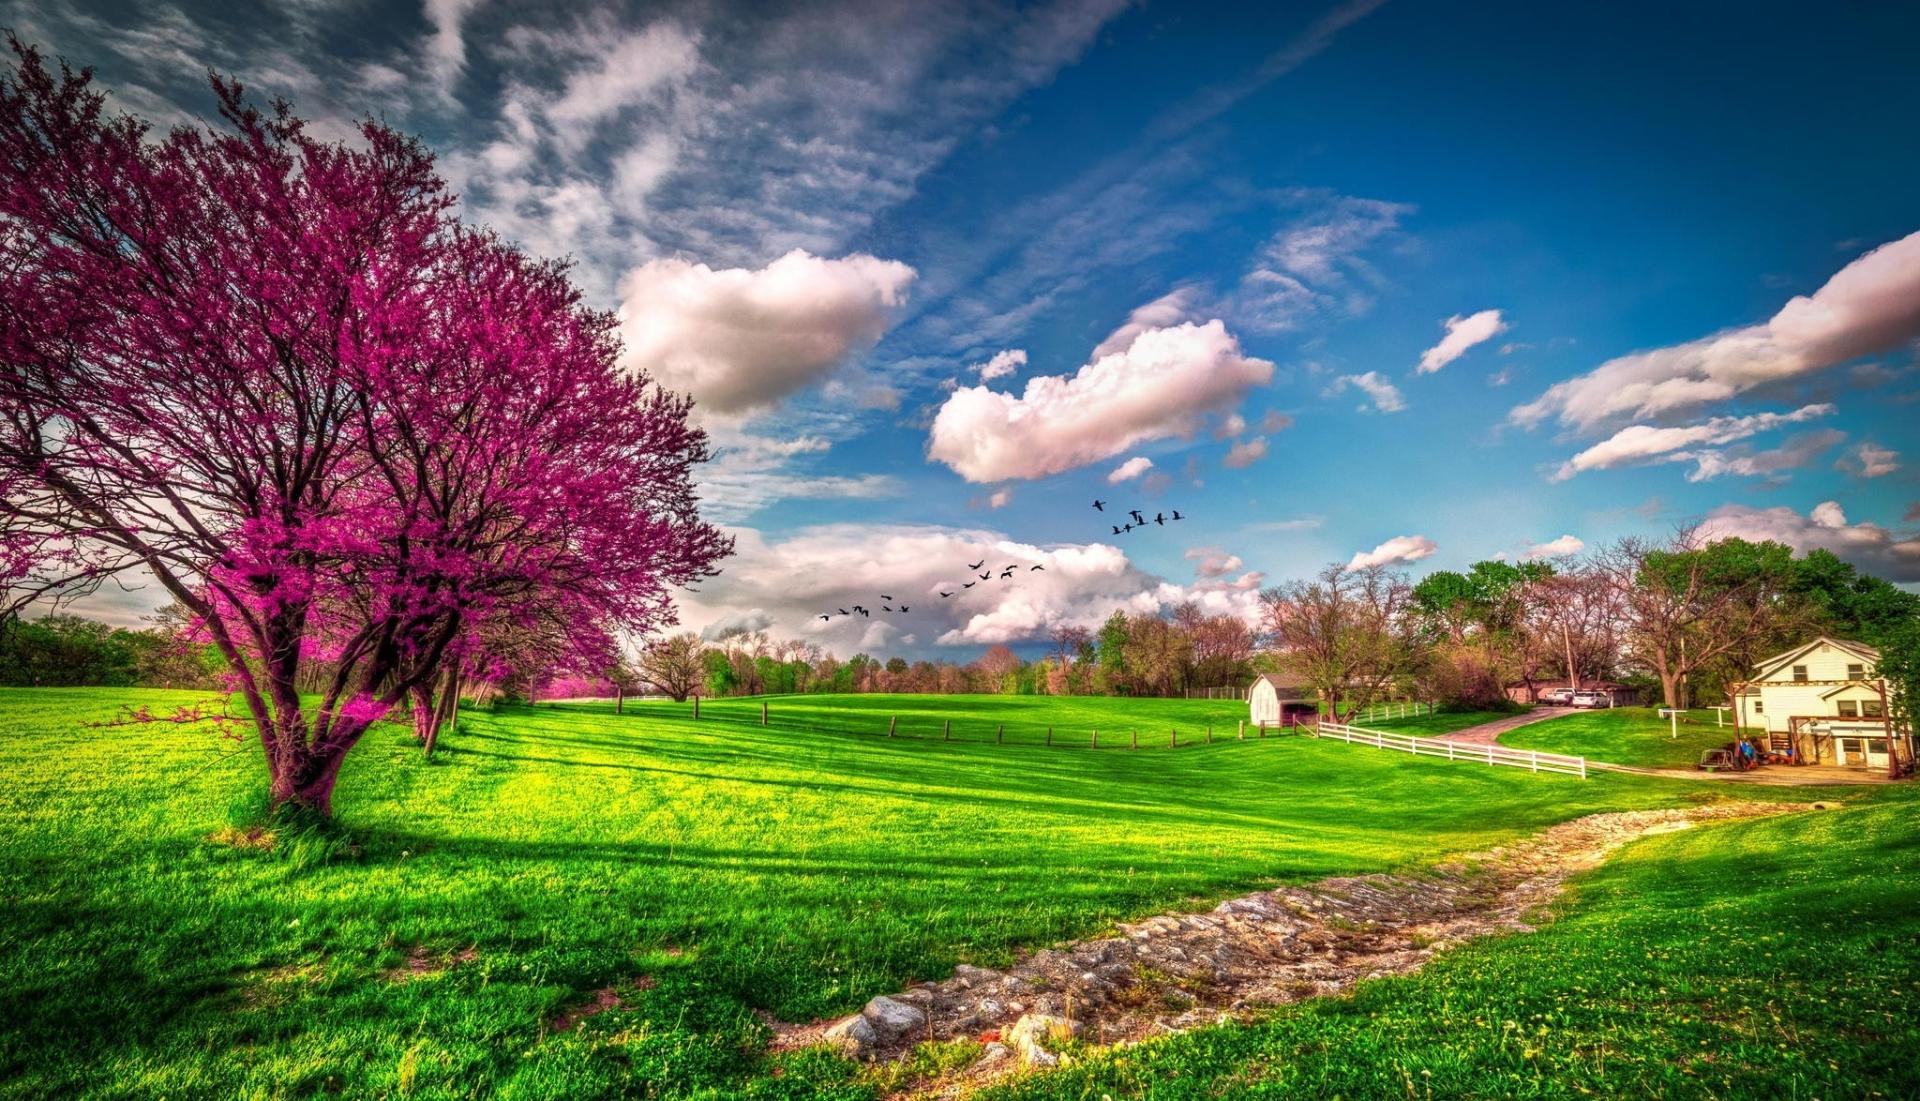 Fondos de pantalla de primavera wallpapers hd for Ver fondos de pantalla